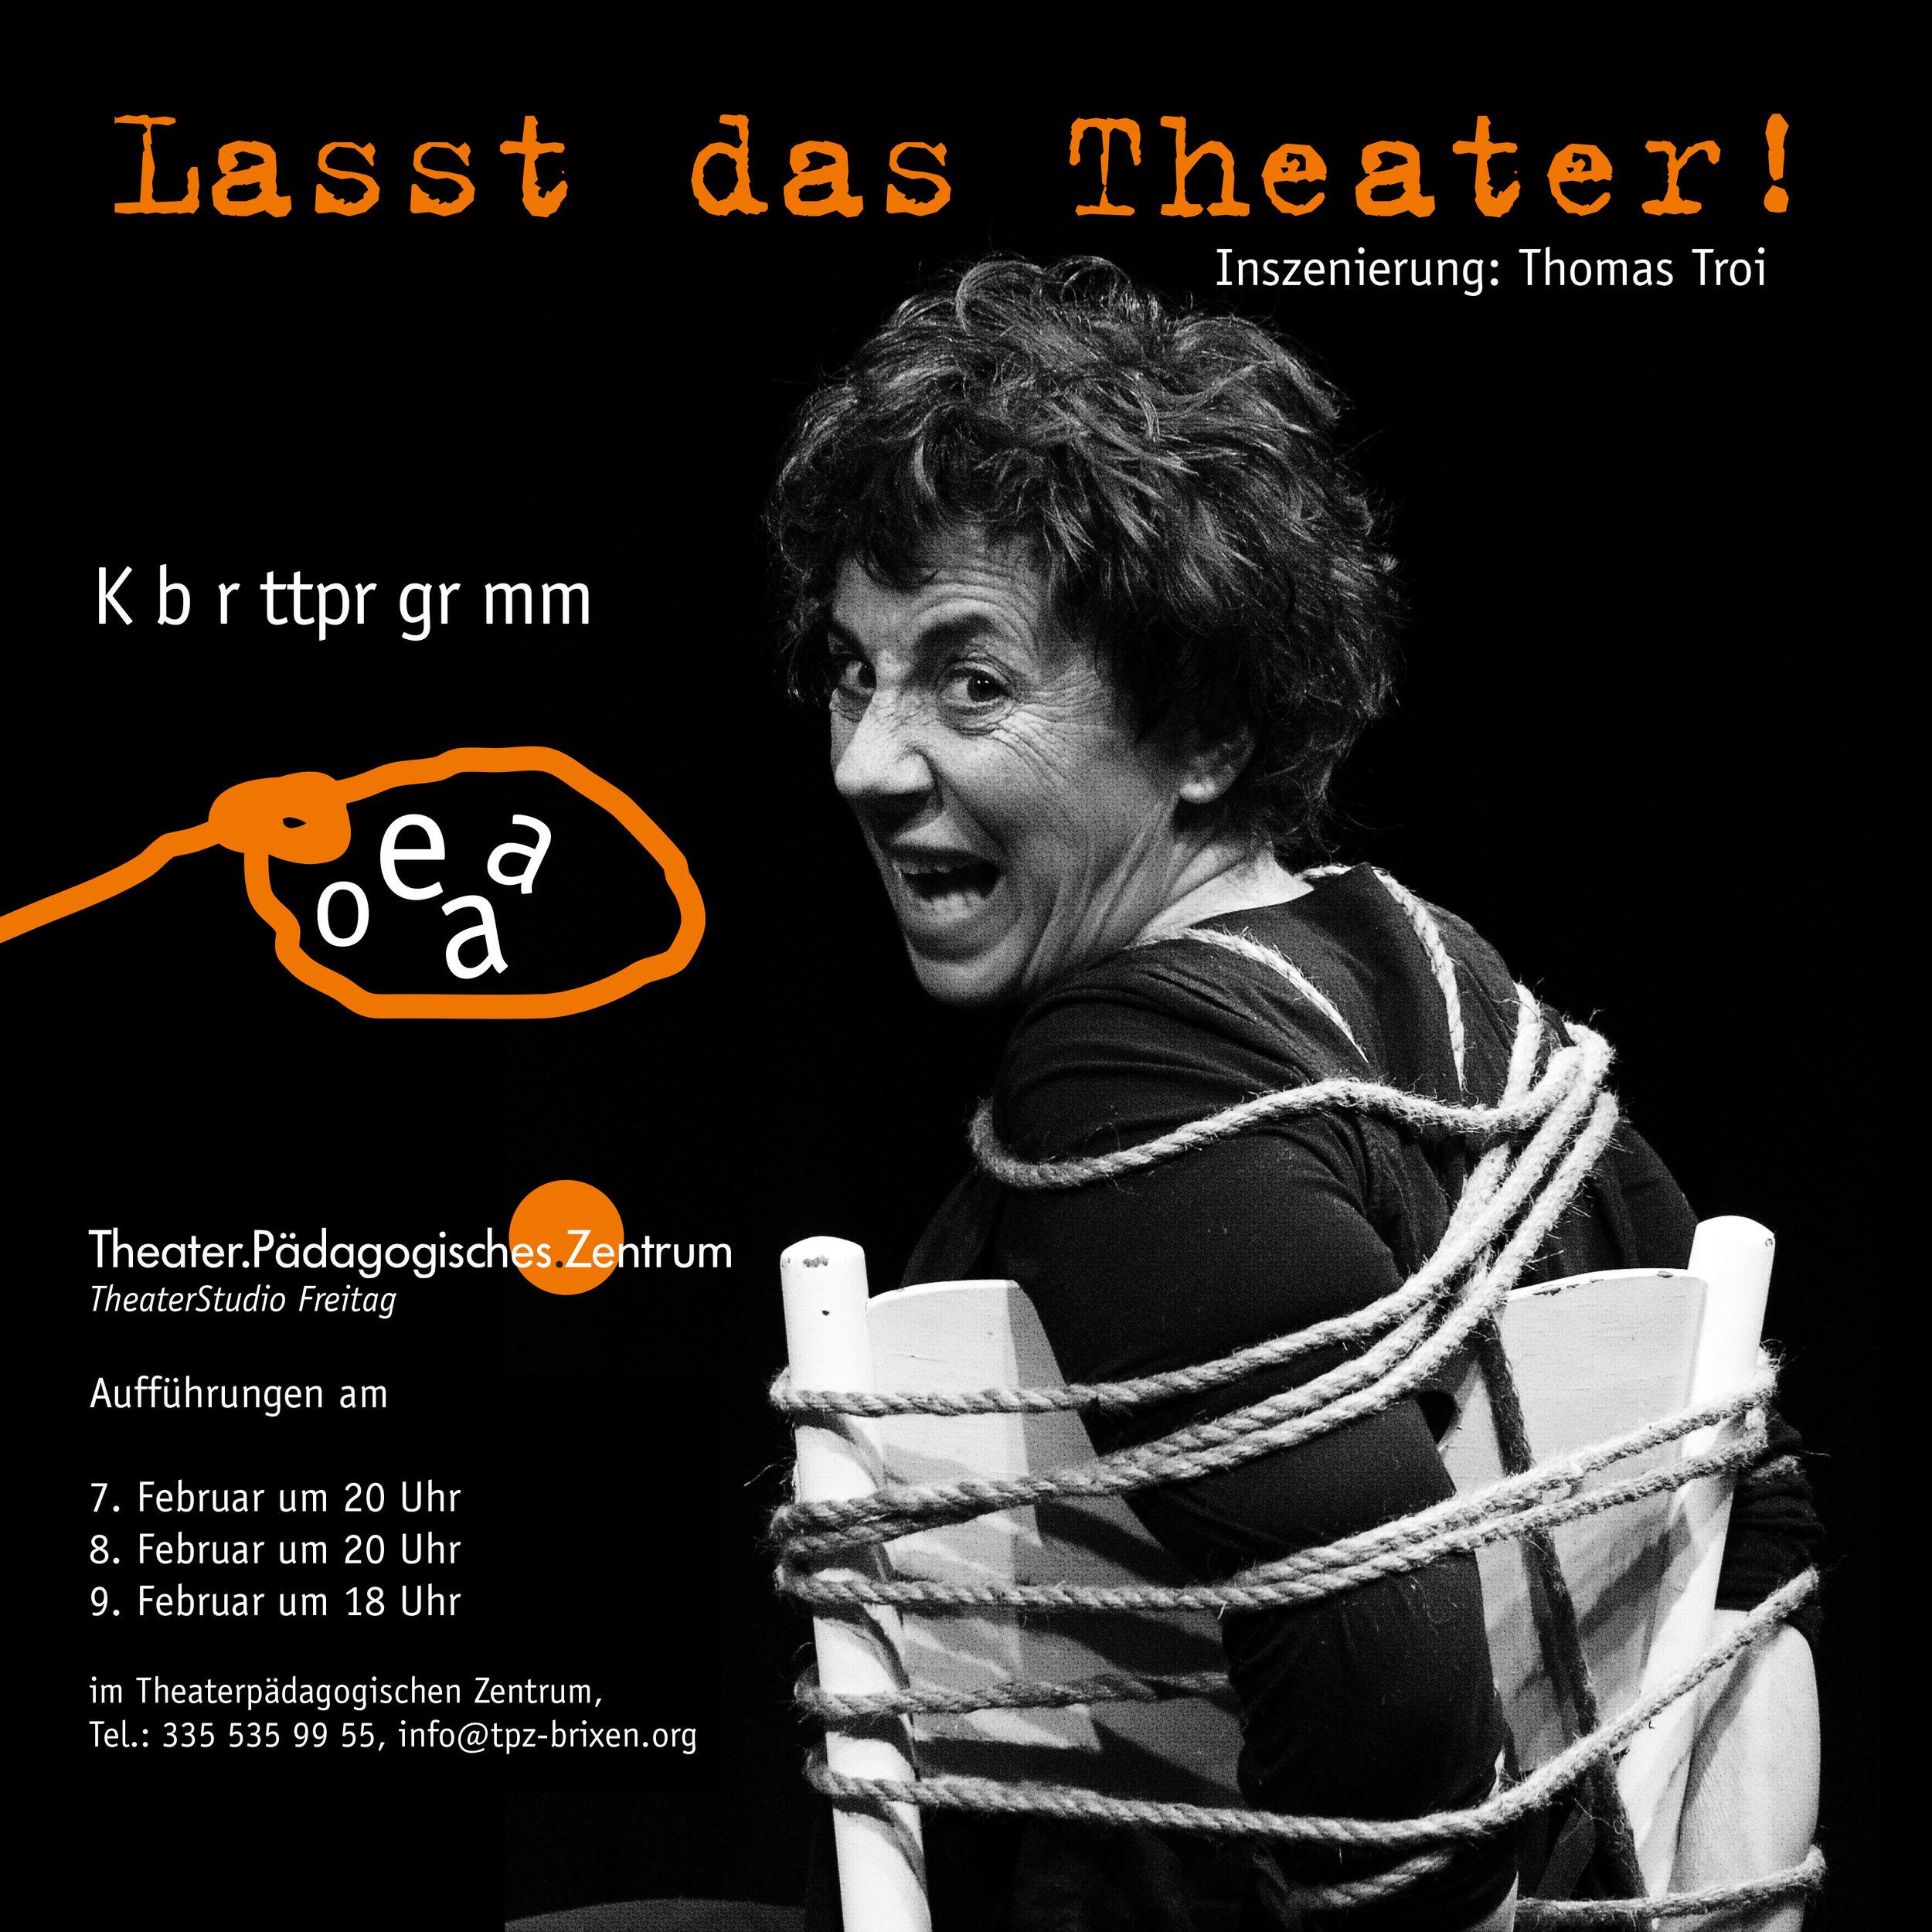 2014 TSF Lasst das Theater Plakat.jpg